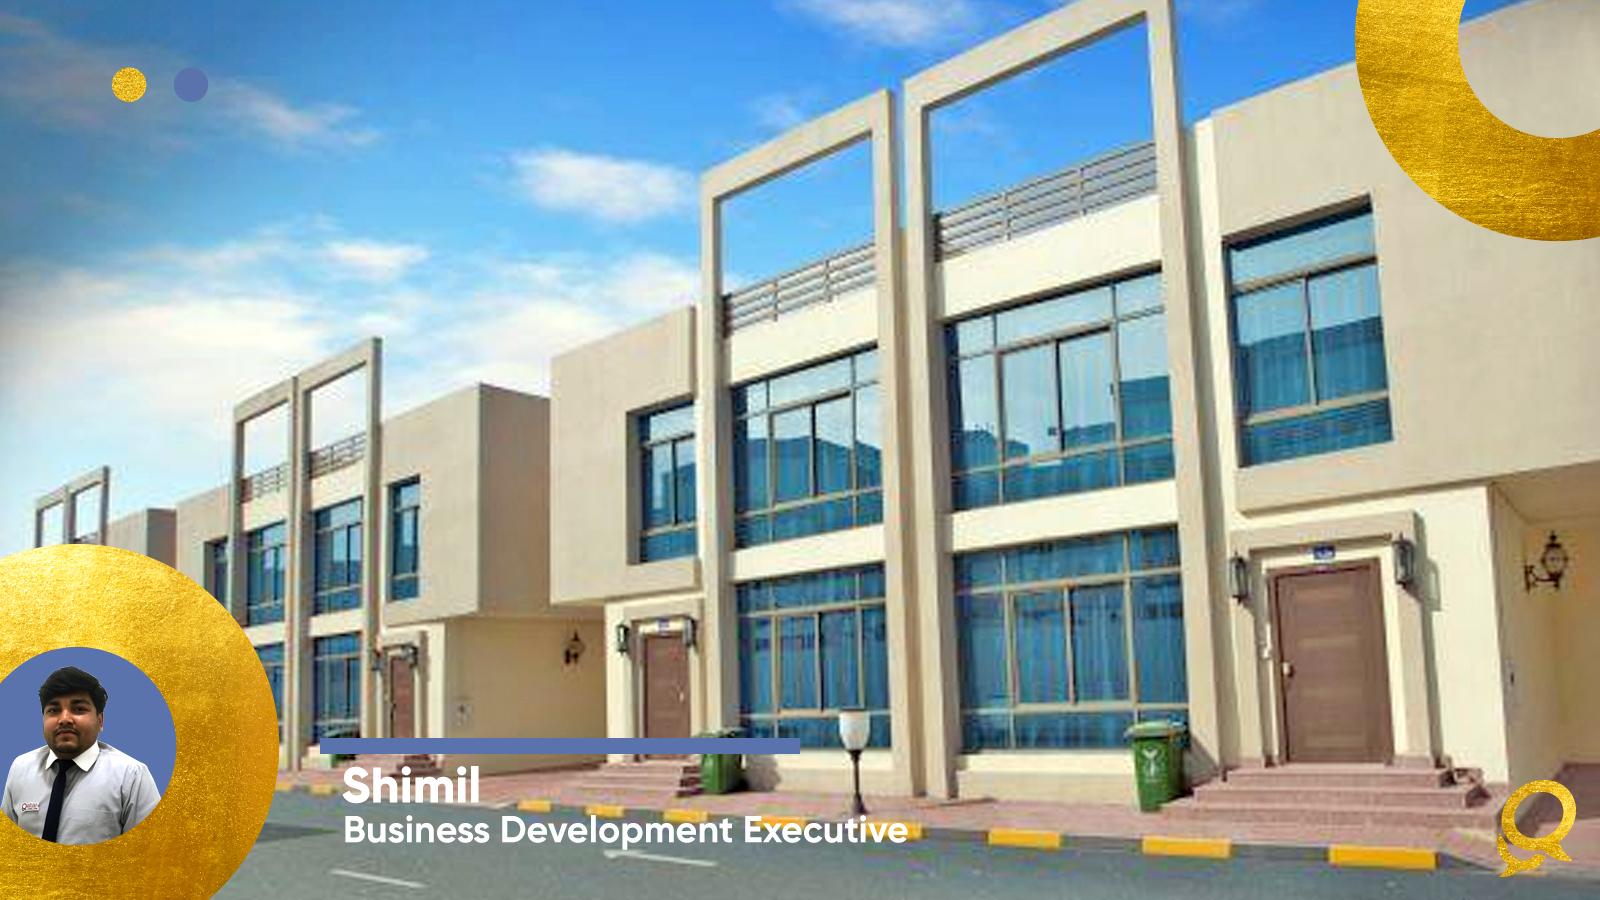 Shimil's February pick - 6-bedroom villa in Al Wukair